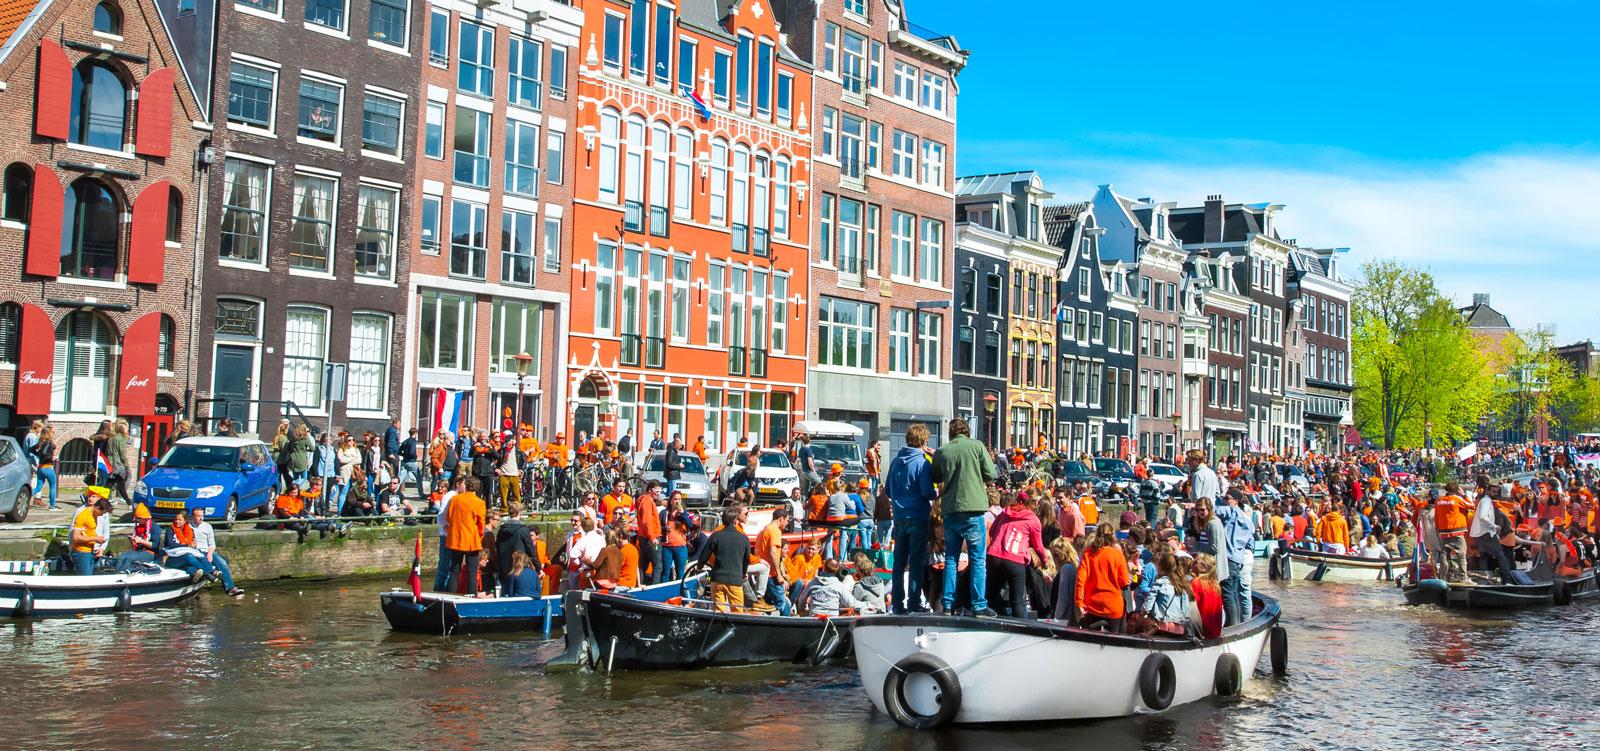 King's Day celebrations in Amsterdam.